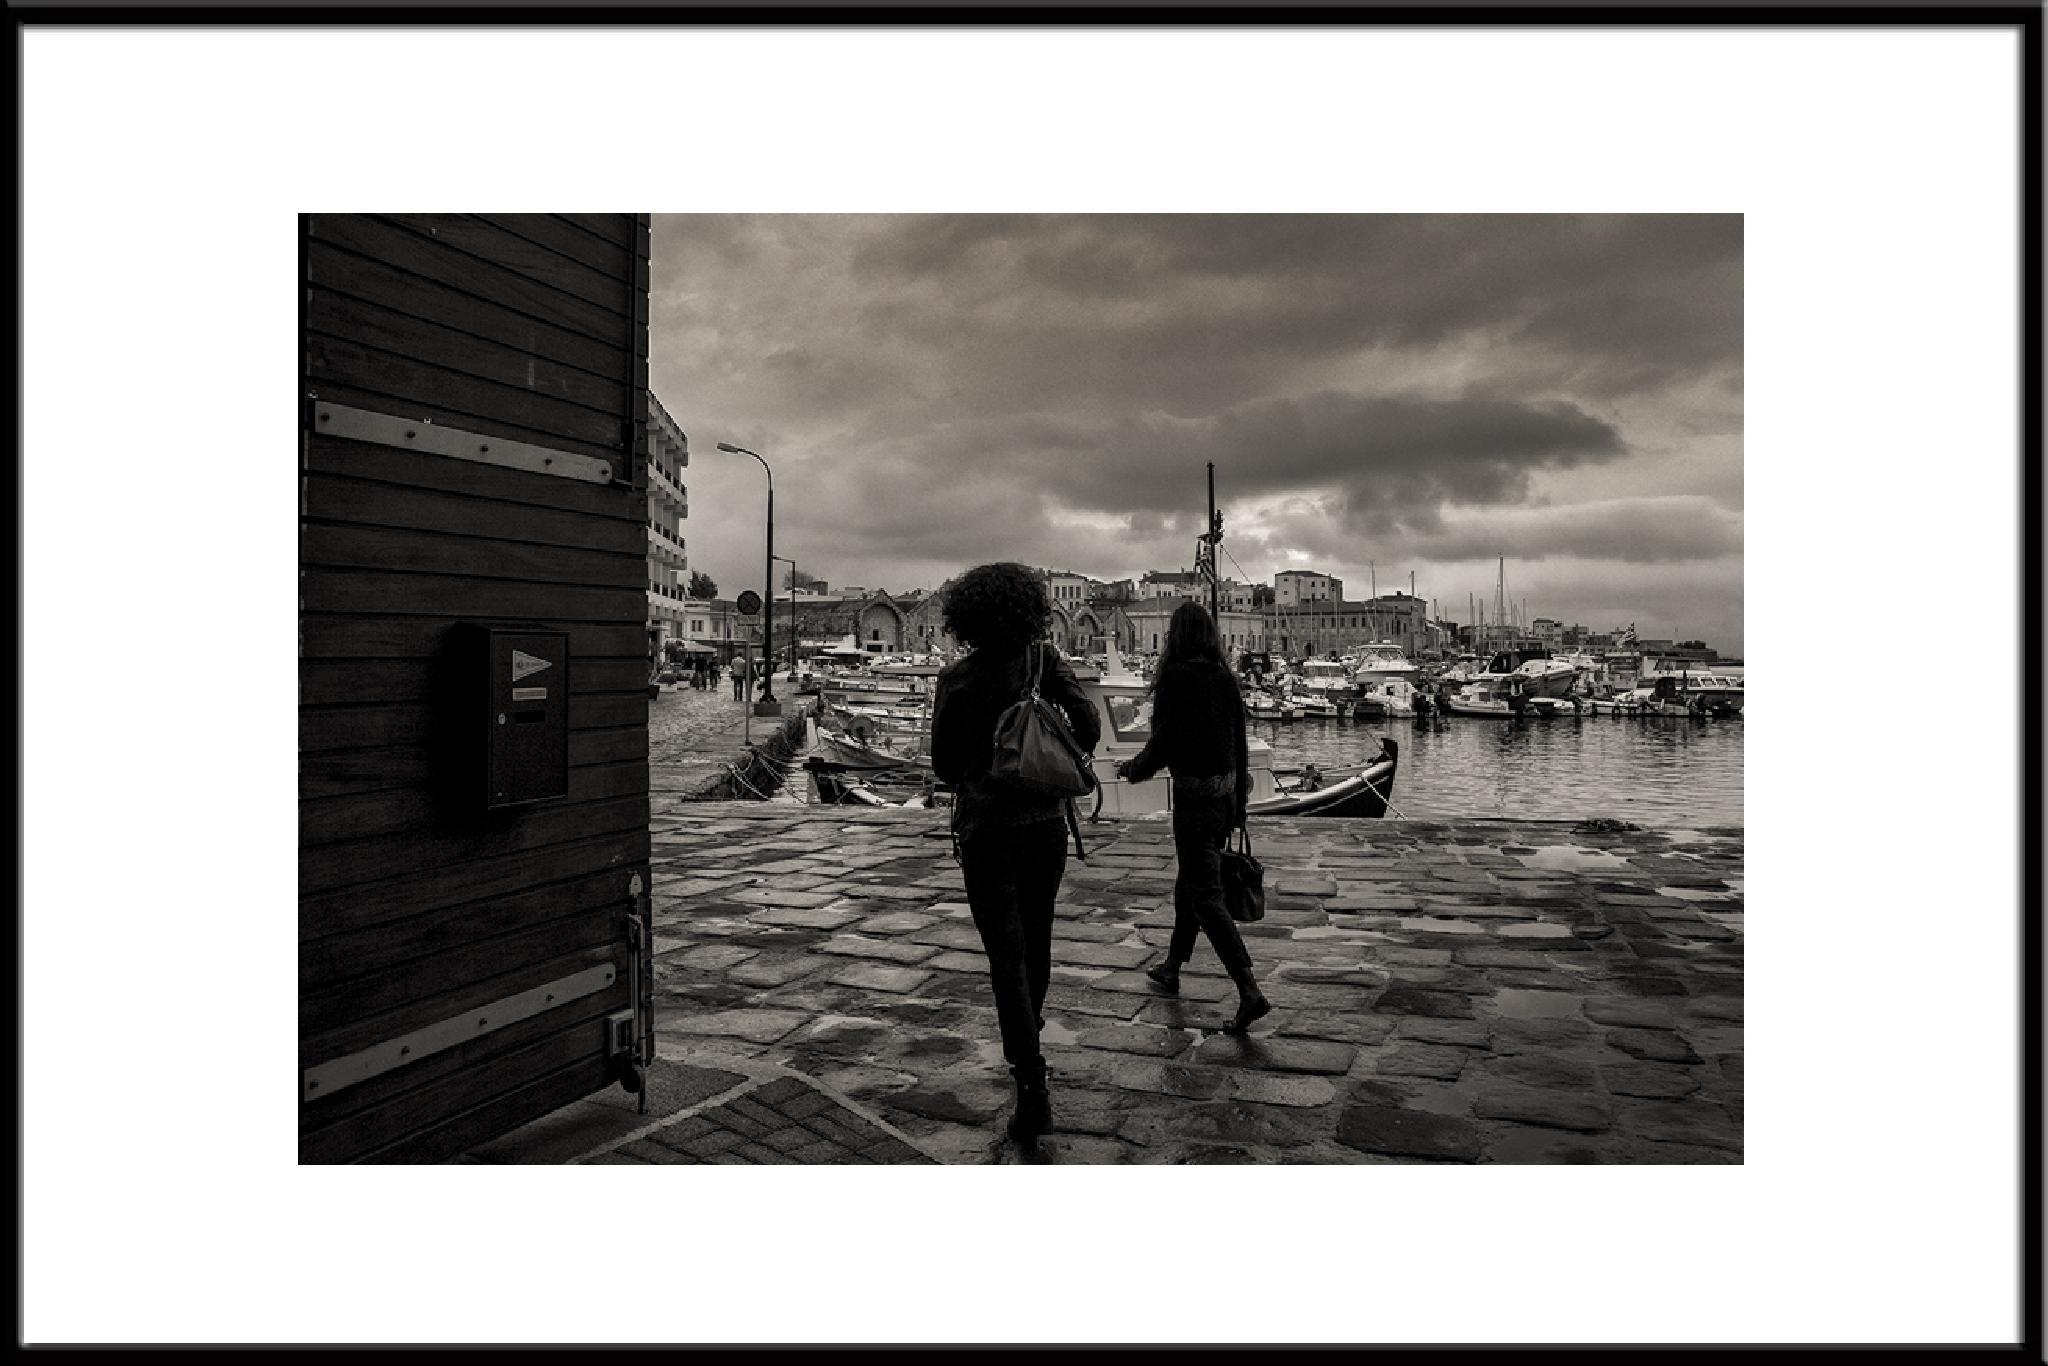 Untitled by NikosPitsilos